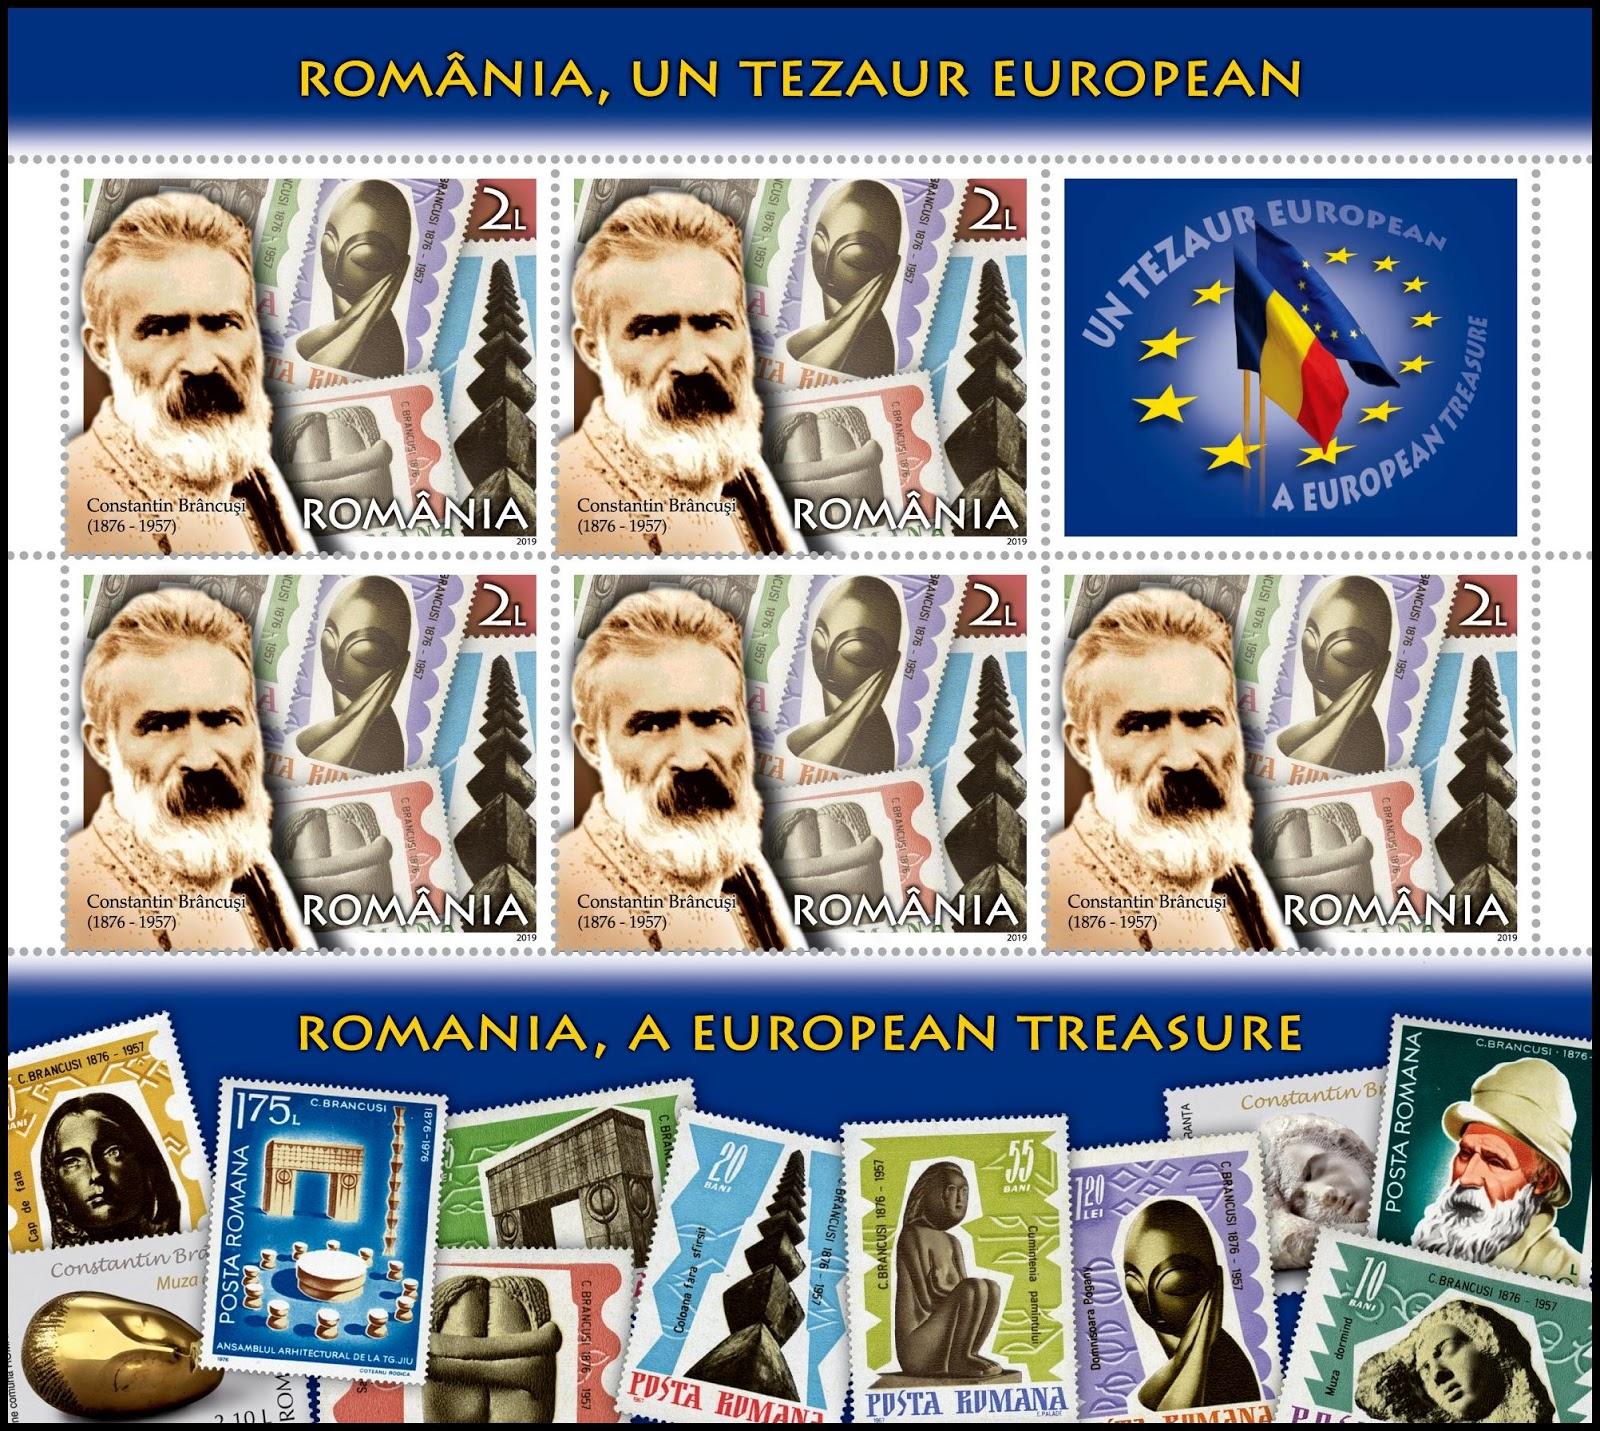 Romania - A National Treasure (January 16, 2019) design #1 sheet of 5 + label